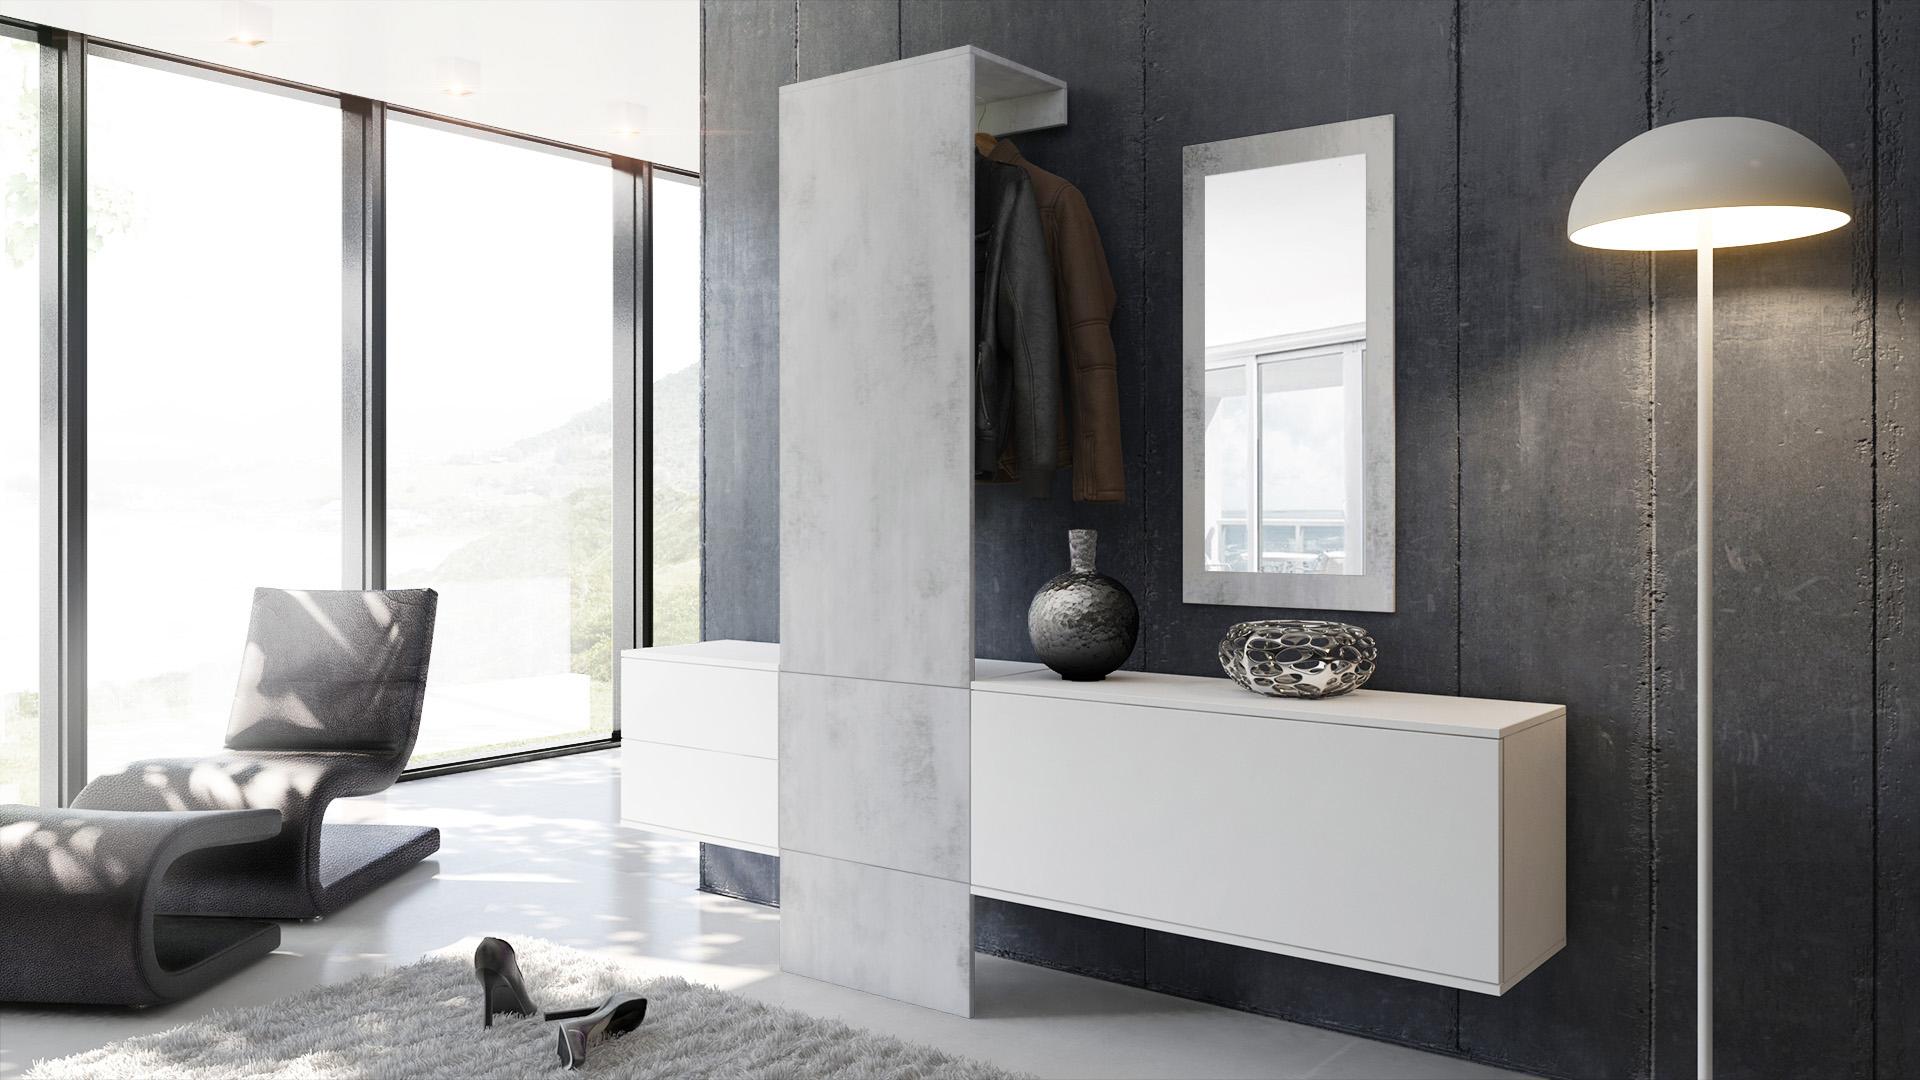 garderobe garderobenset flur spiegel paneele carlton set 1. Black Bedroom Furniture Sets. Home Design Ideas